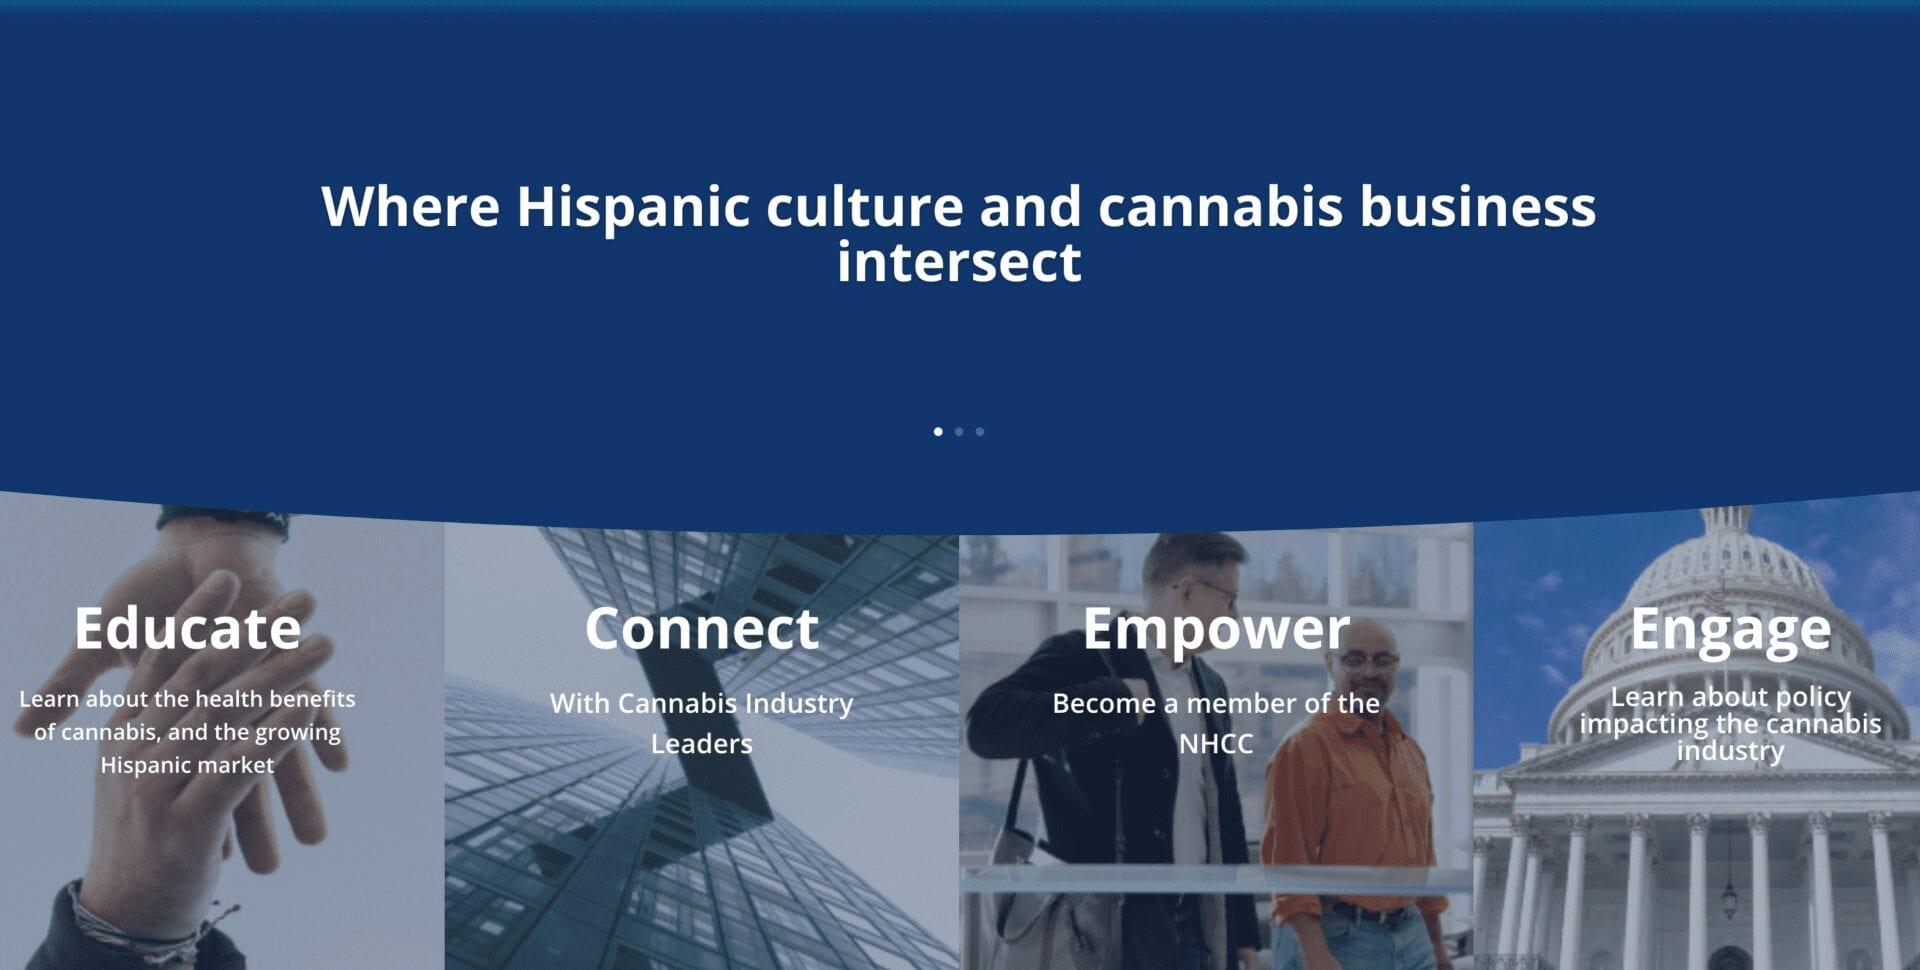 National Hispanic Cannabis Council